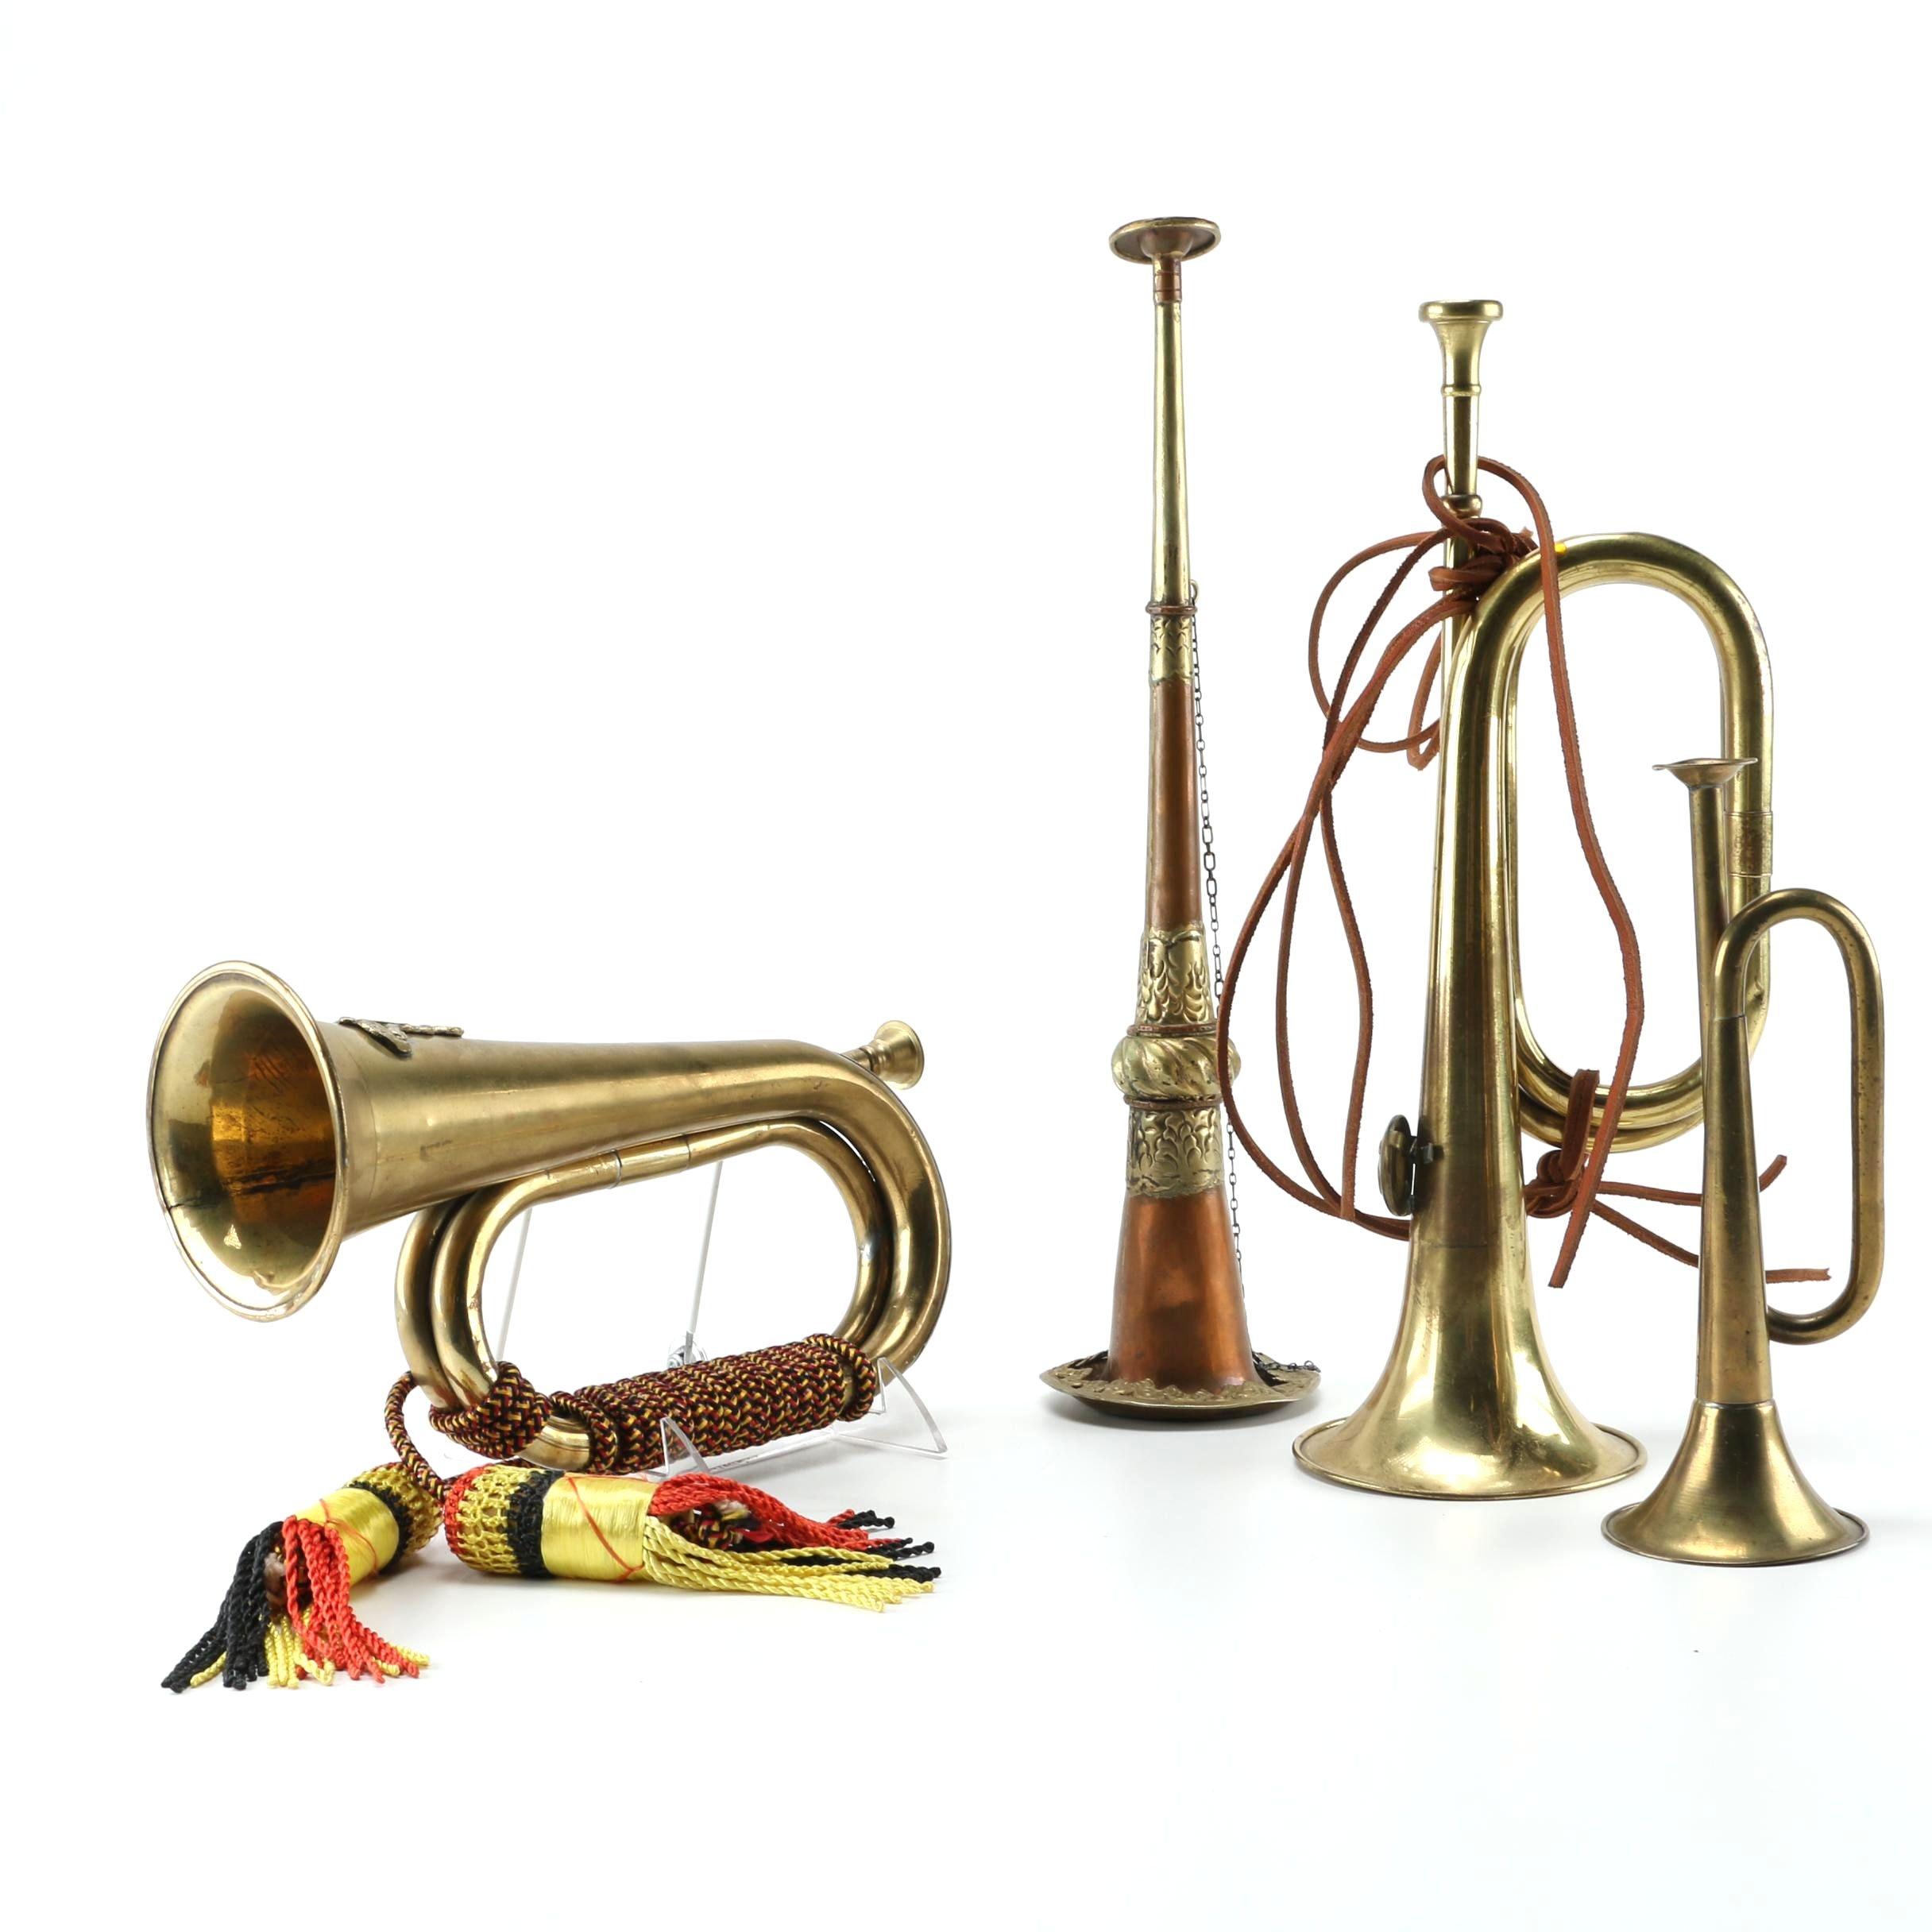 Vintage Bugles and Indonesian Ekkalam Horn